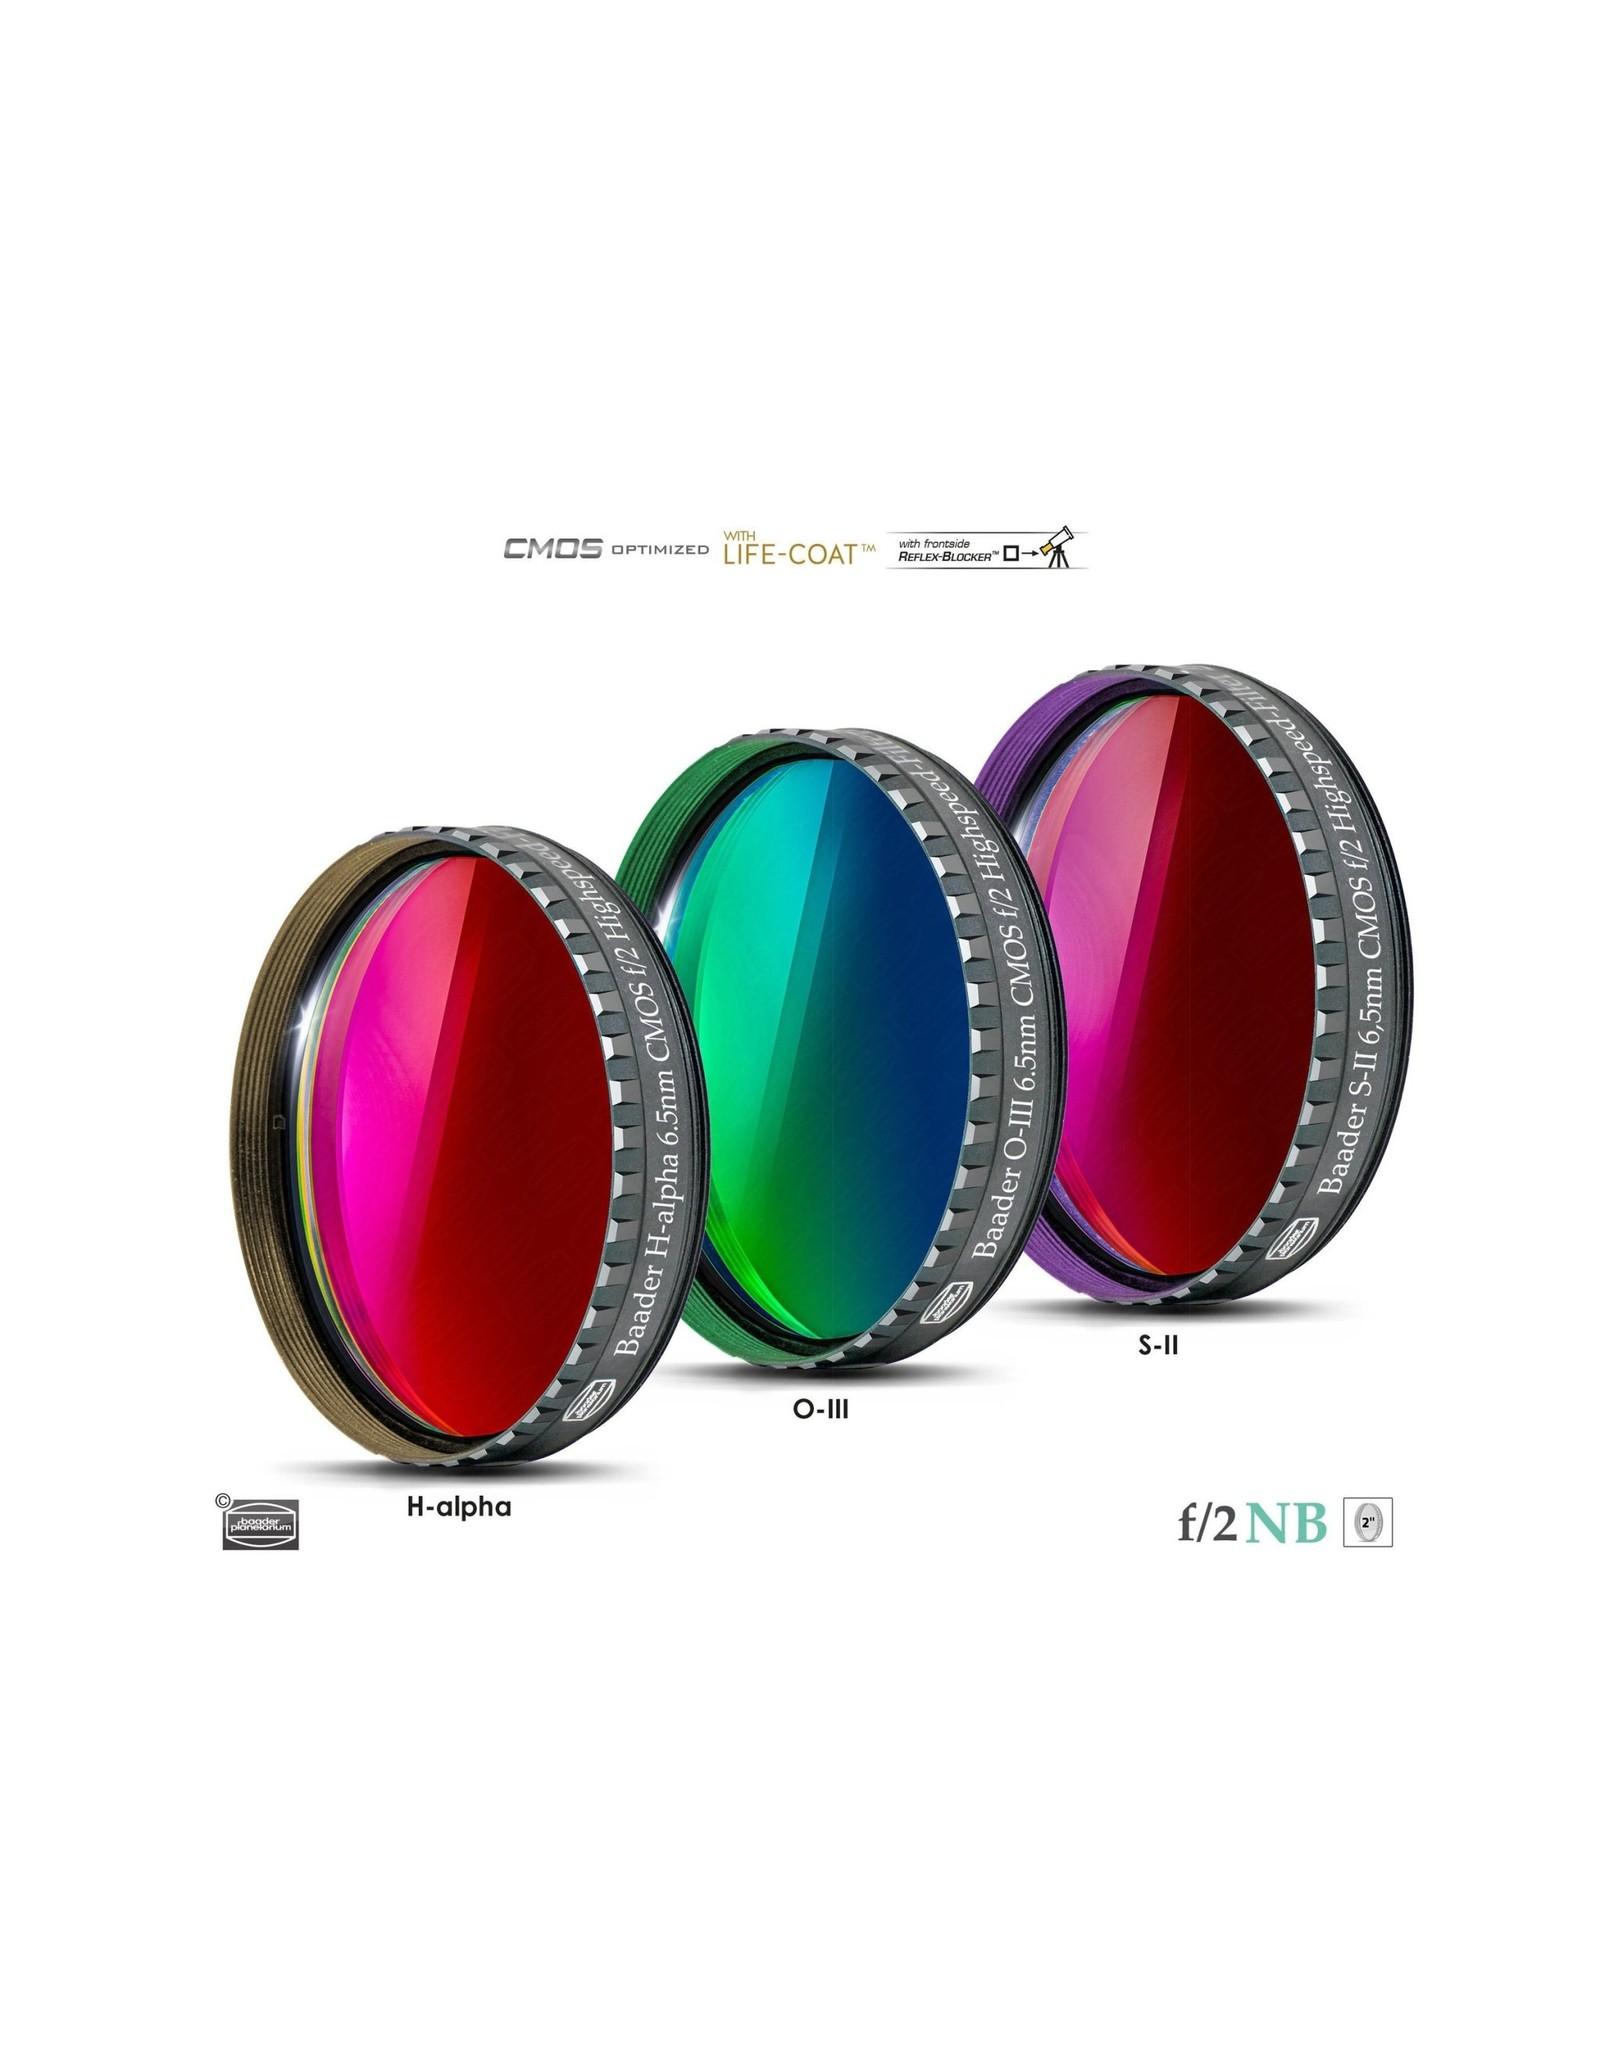 Baader Planetarium Baader 3.5 / 4nm f/2 Ultra-Highspeed Filter set – CMOS-optimized - H-alpha / O-III / S-II (Specify Size)